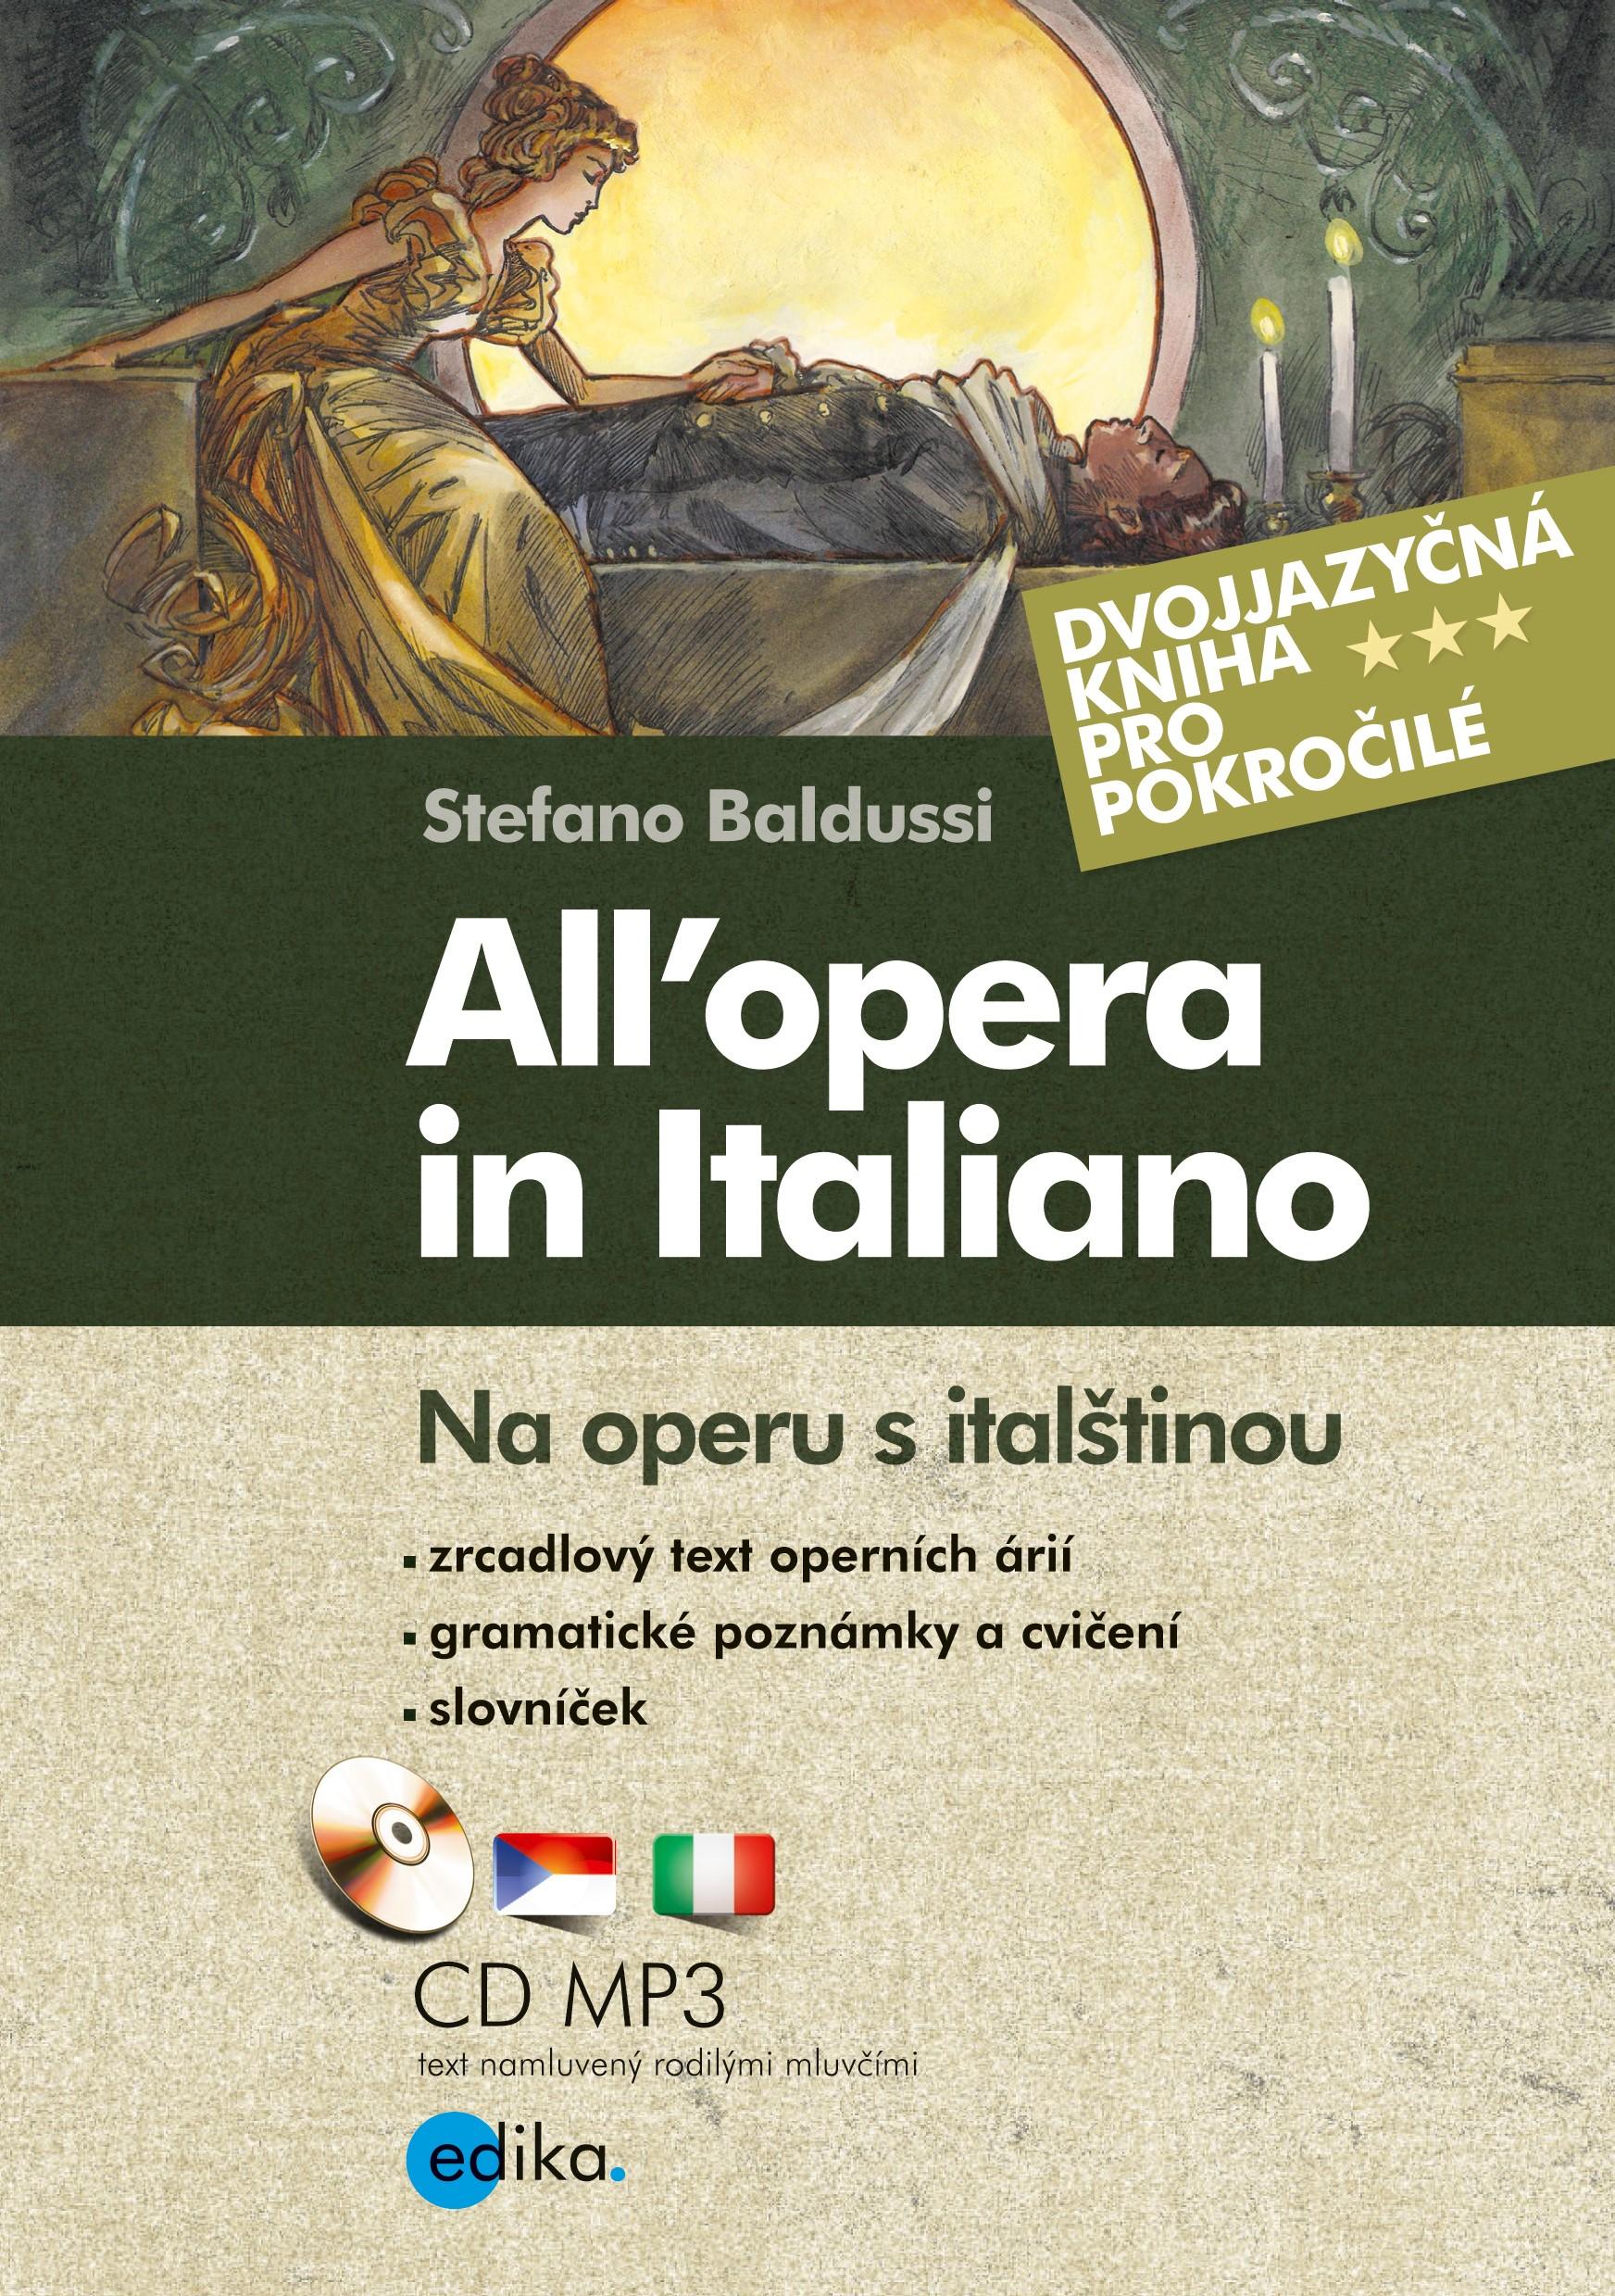 Na operu s italštinou. All'opera in Italiano | Stefano Baldussi